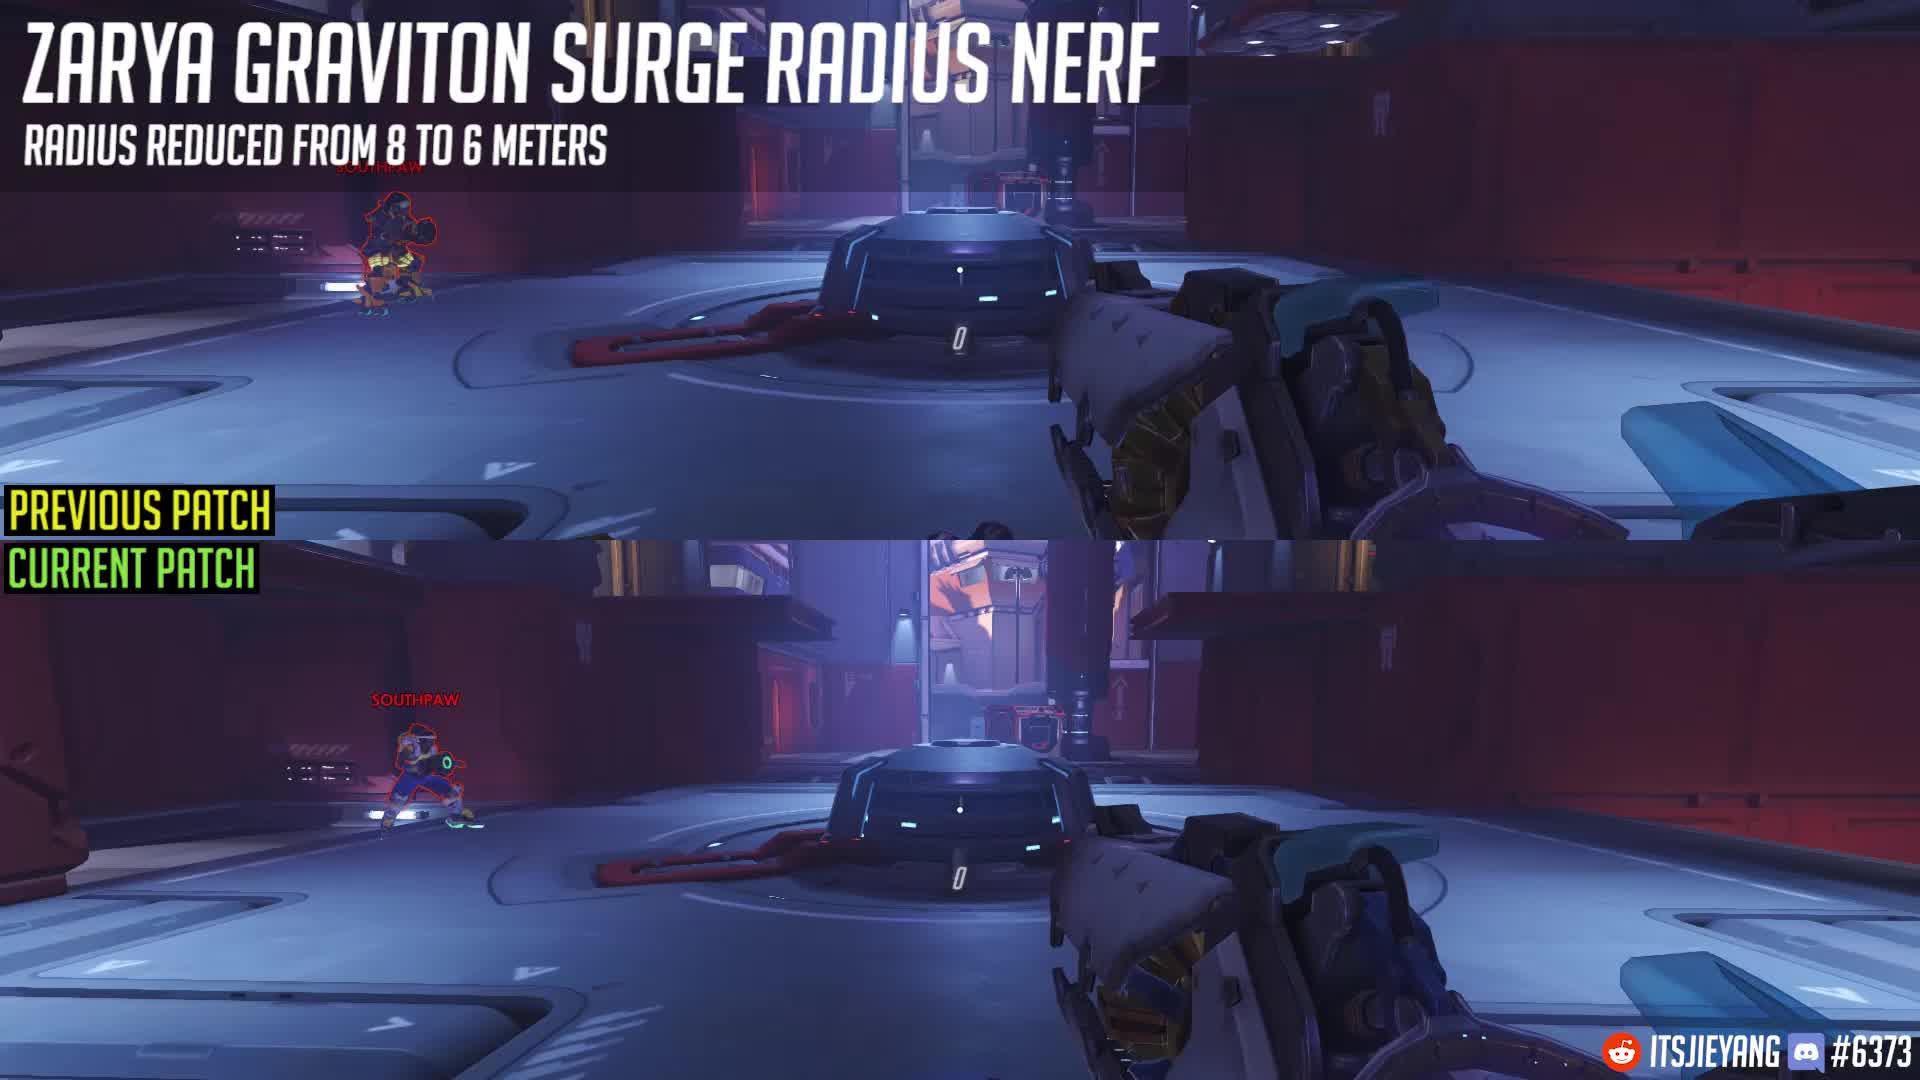 Zarya, overwatch, Overwatch Patch 9th August - Zarya Graviton Surge Nerf GIFs